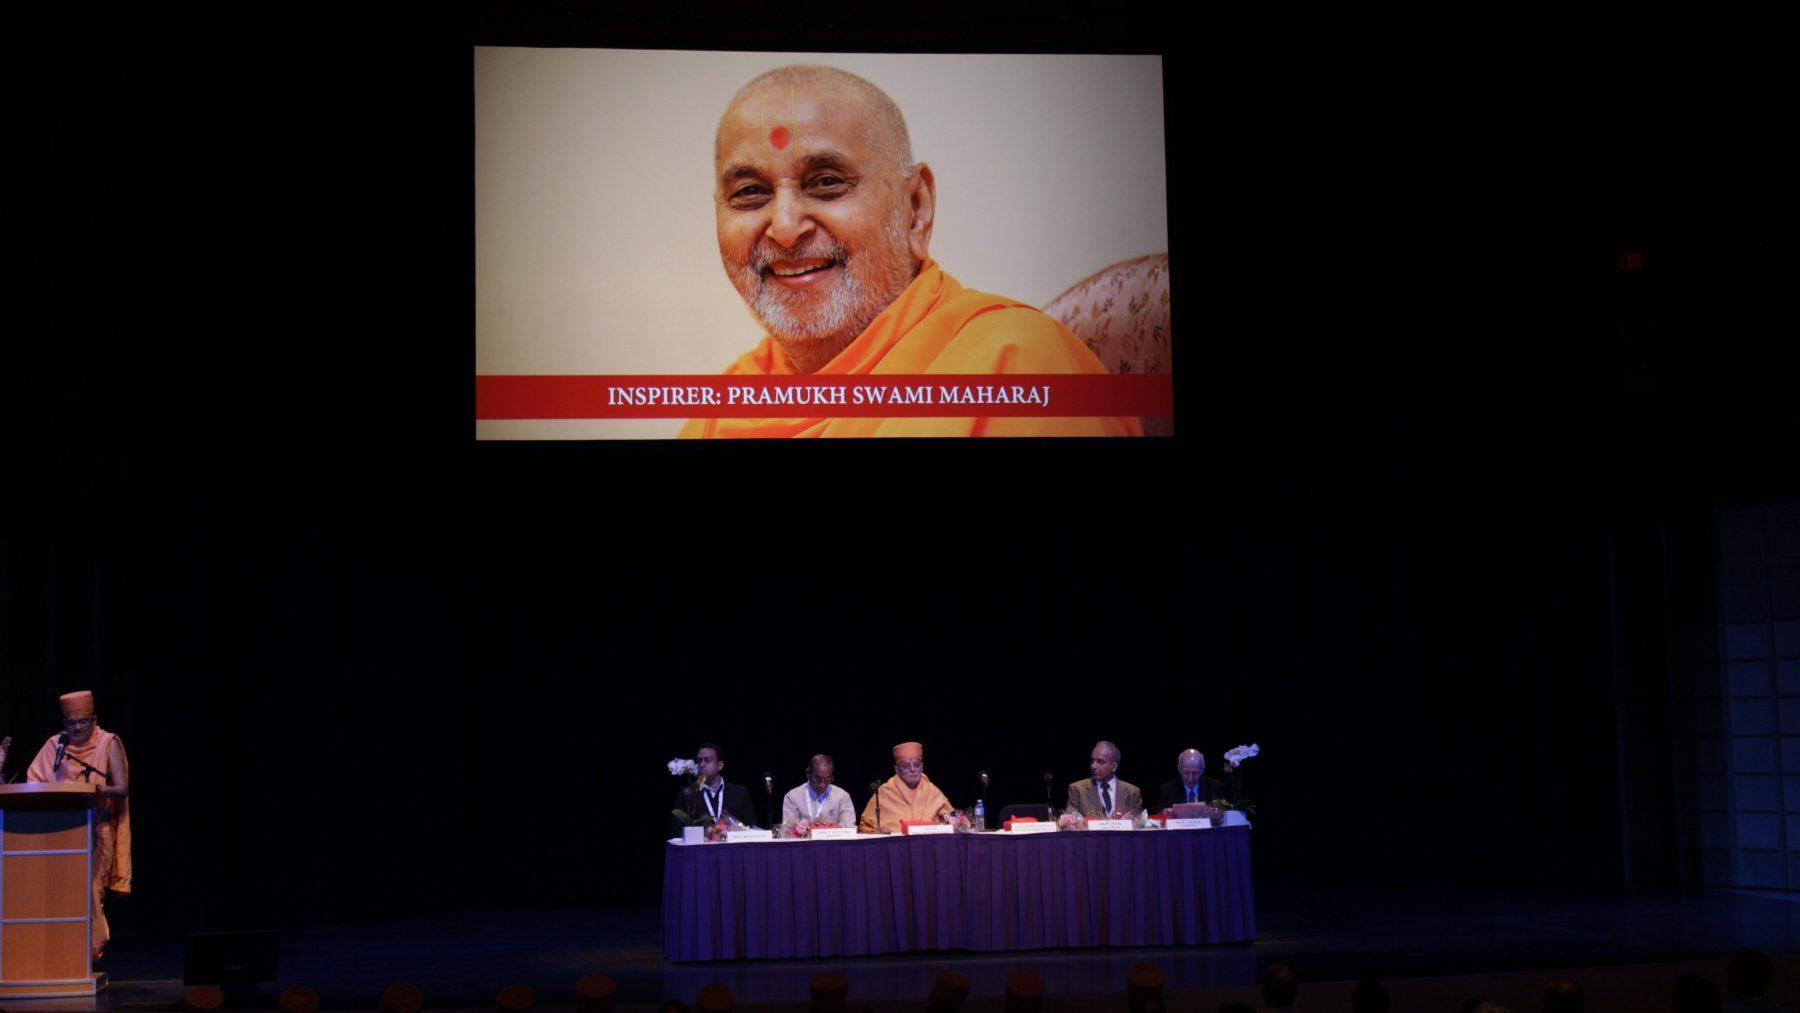 Mahamahopadhyaya Bhadreshdas Swami speaks about his guru, His Holiness Pramukh Swami Maharaj, who inspired him to write the Akshar-Purushottam Darshan